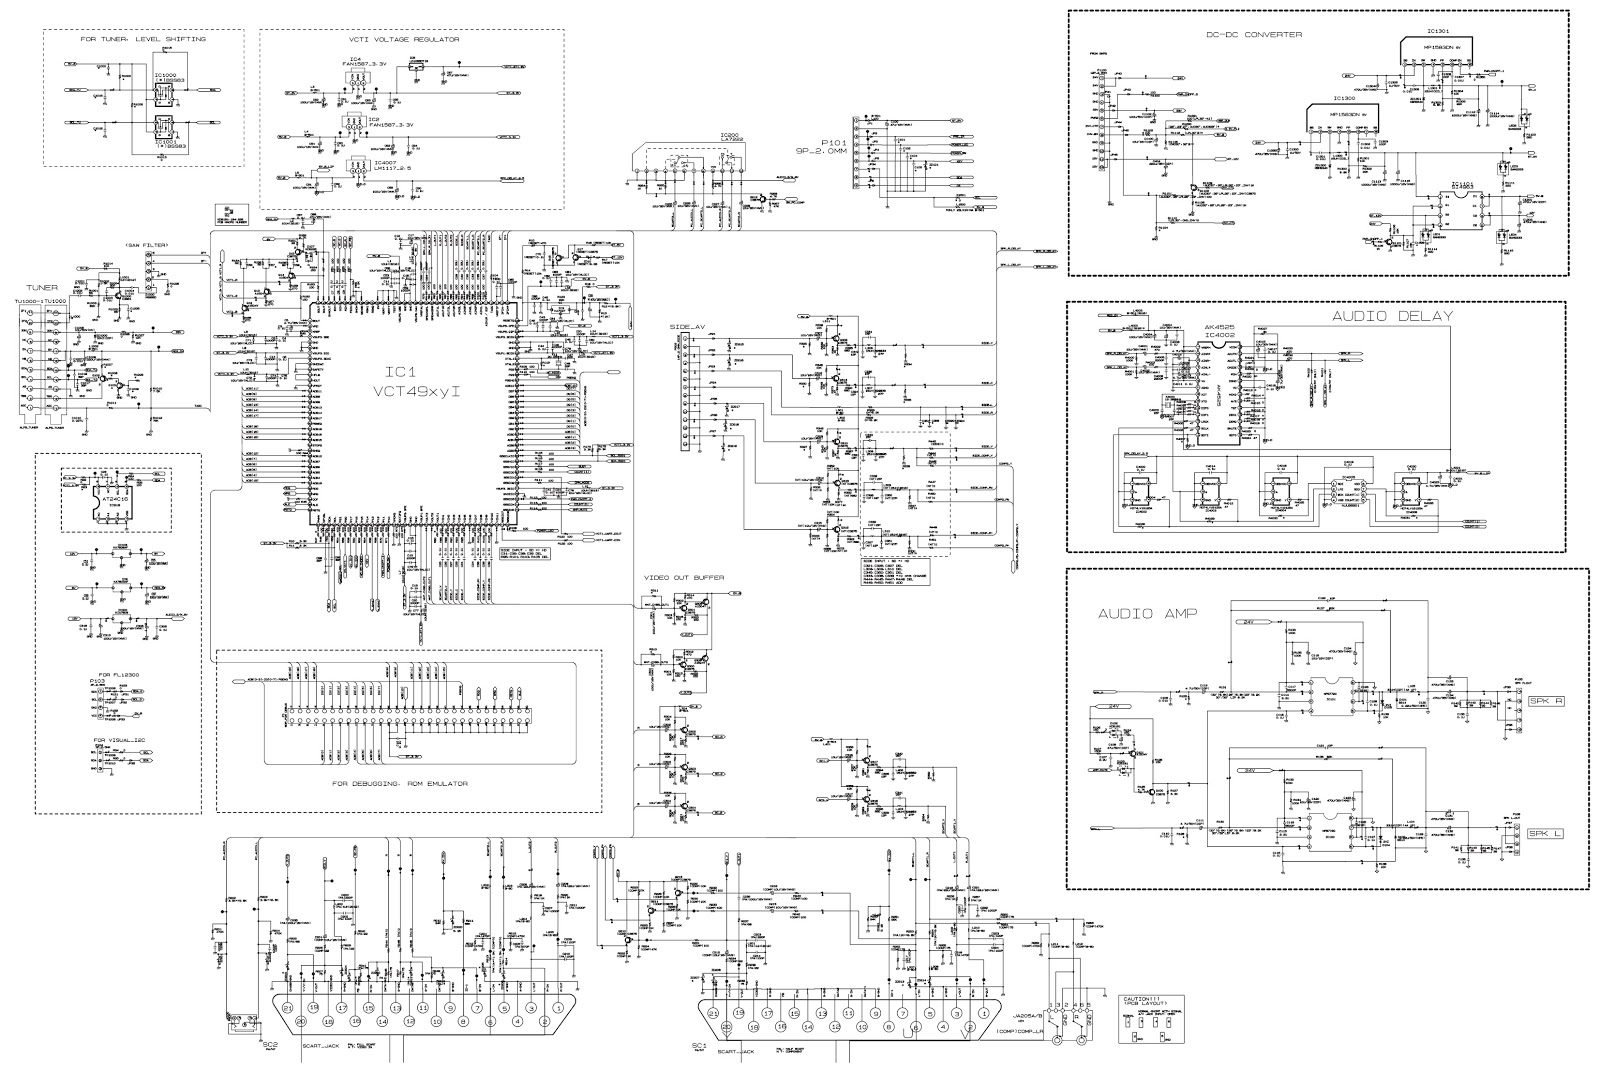 Schematic Diagrams 04 21 16